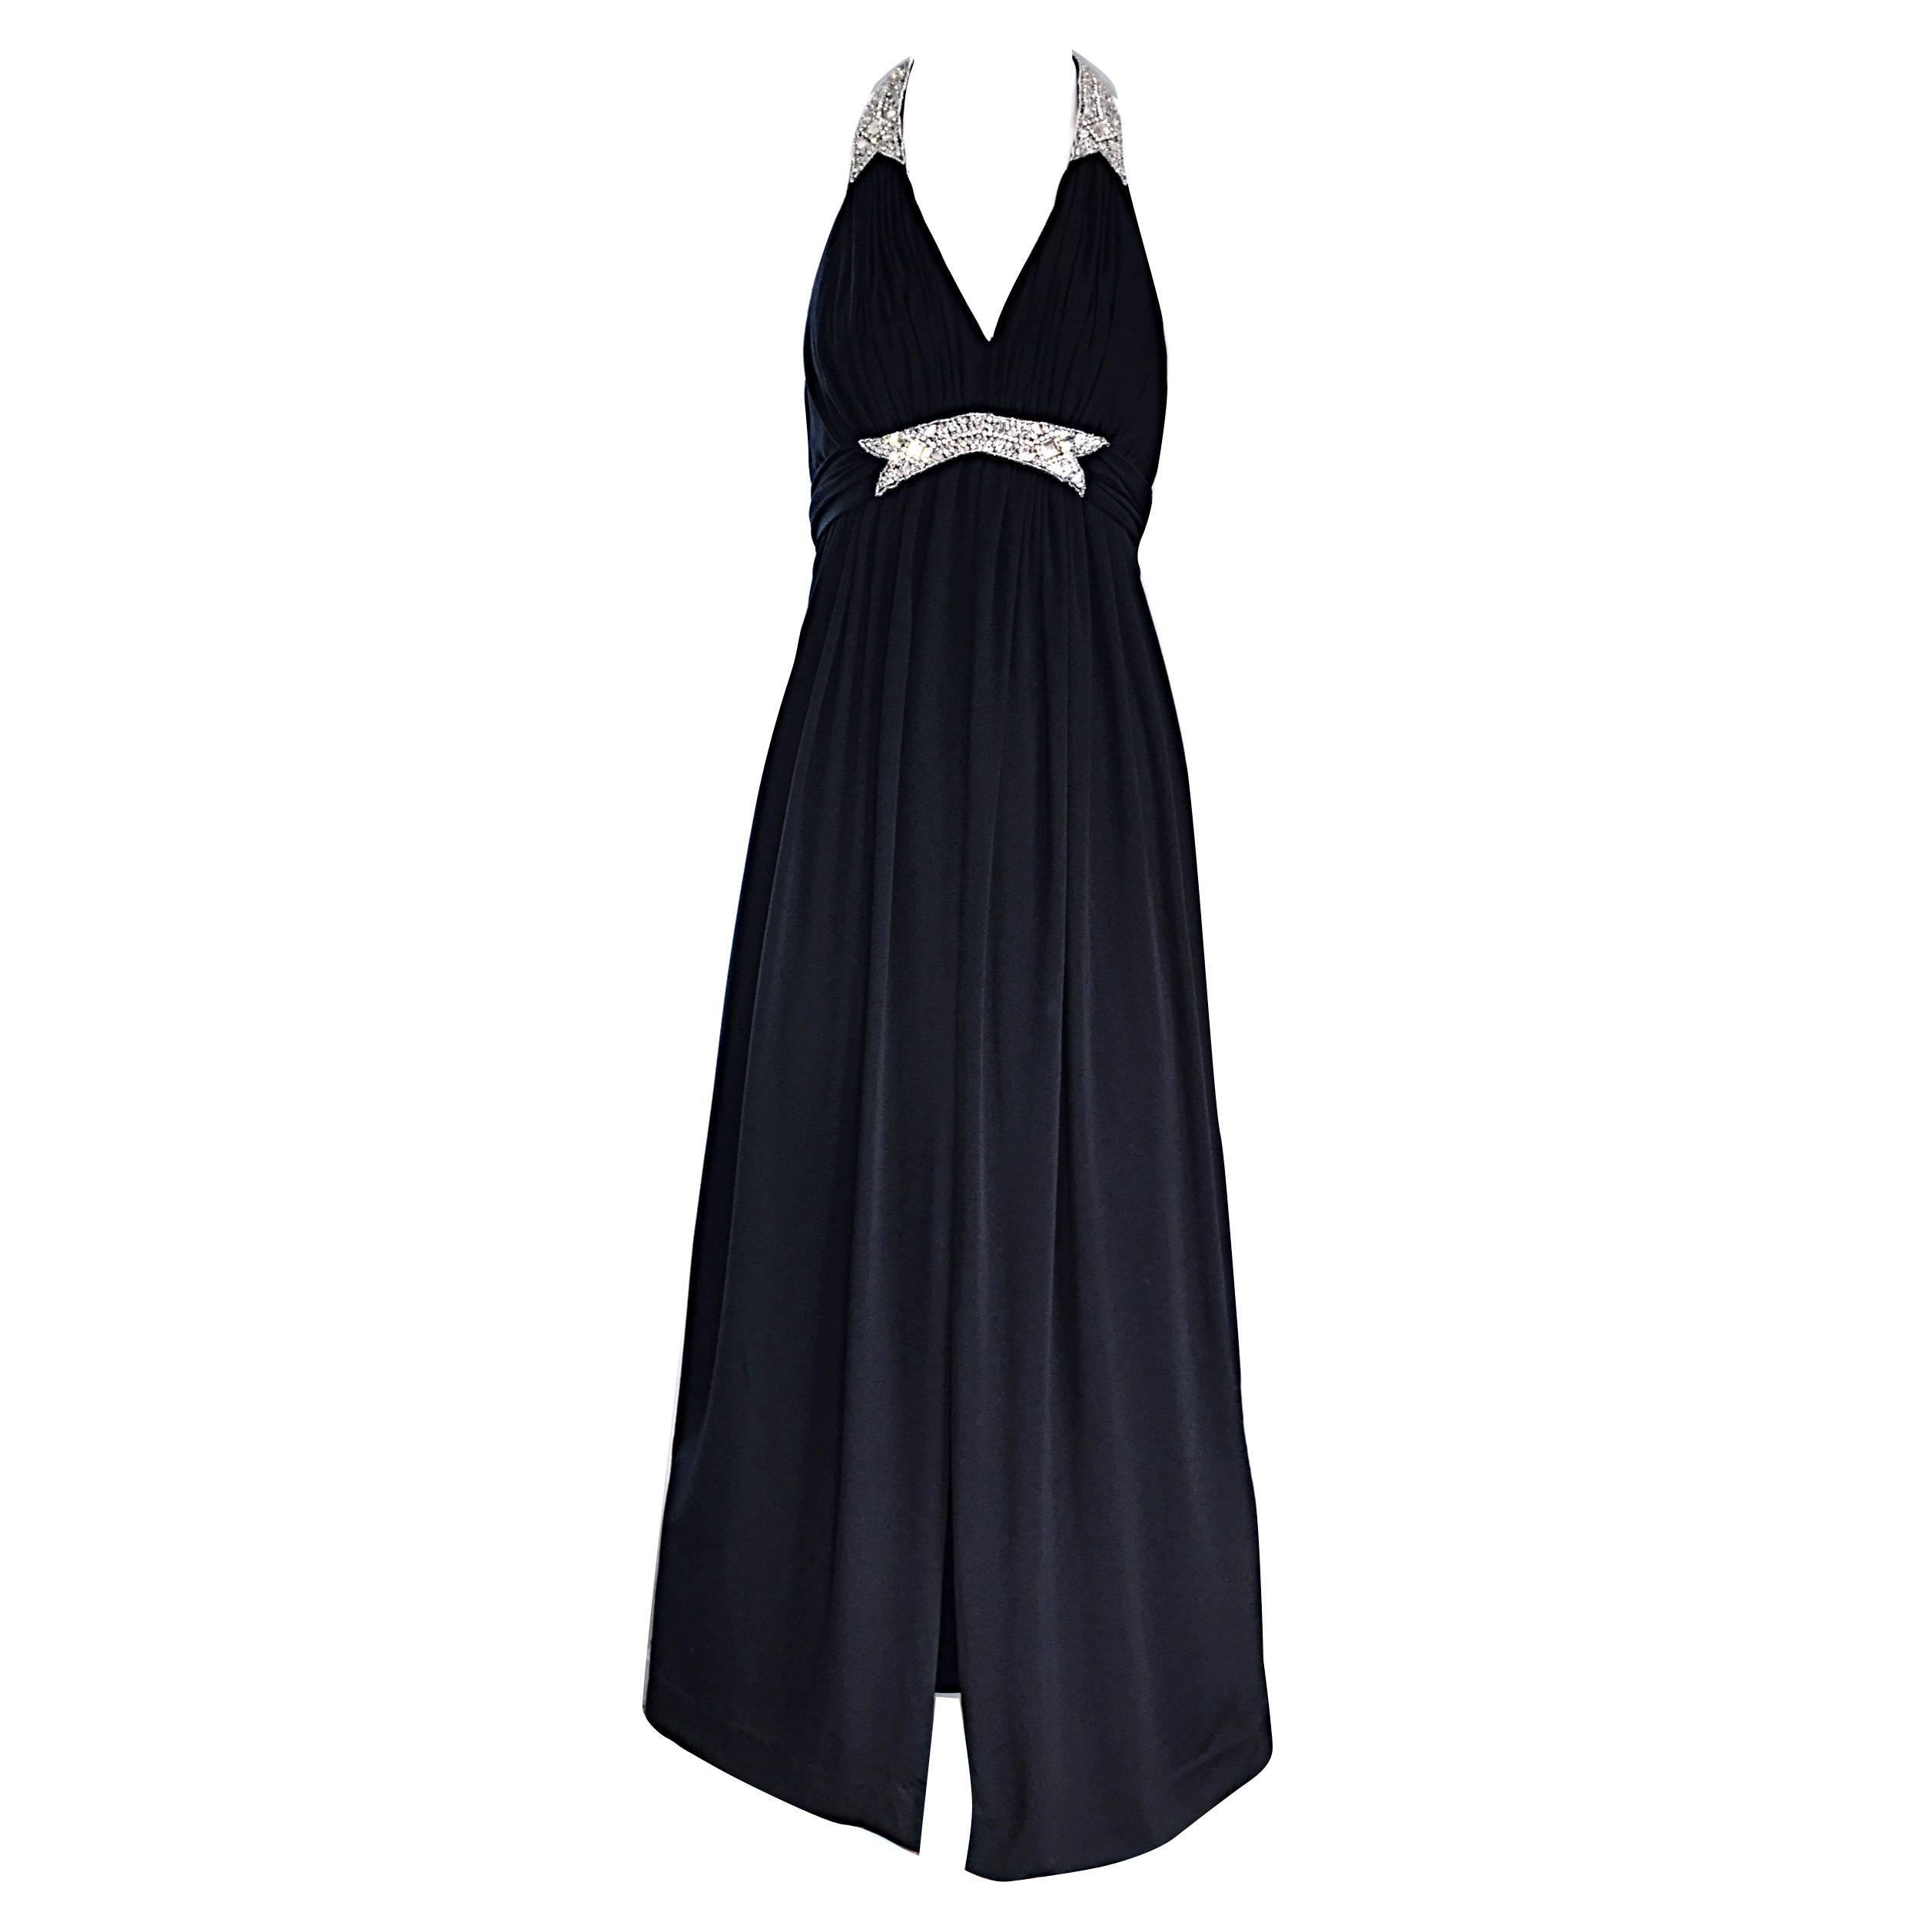 1970s Victoria Royal Black Jersey Rhinestone Encrusted 70s Grecian Halter Gown